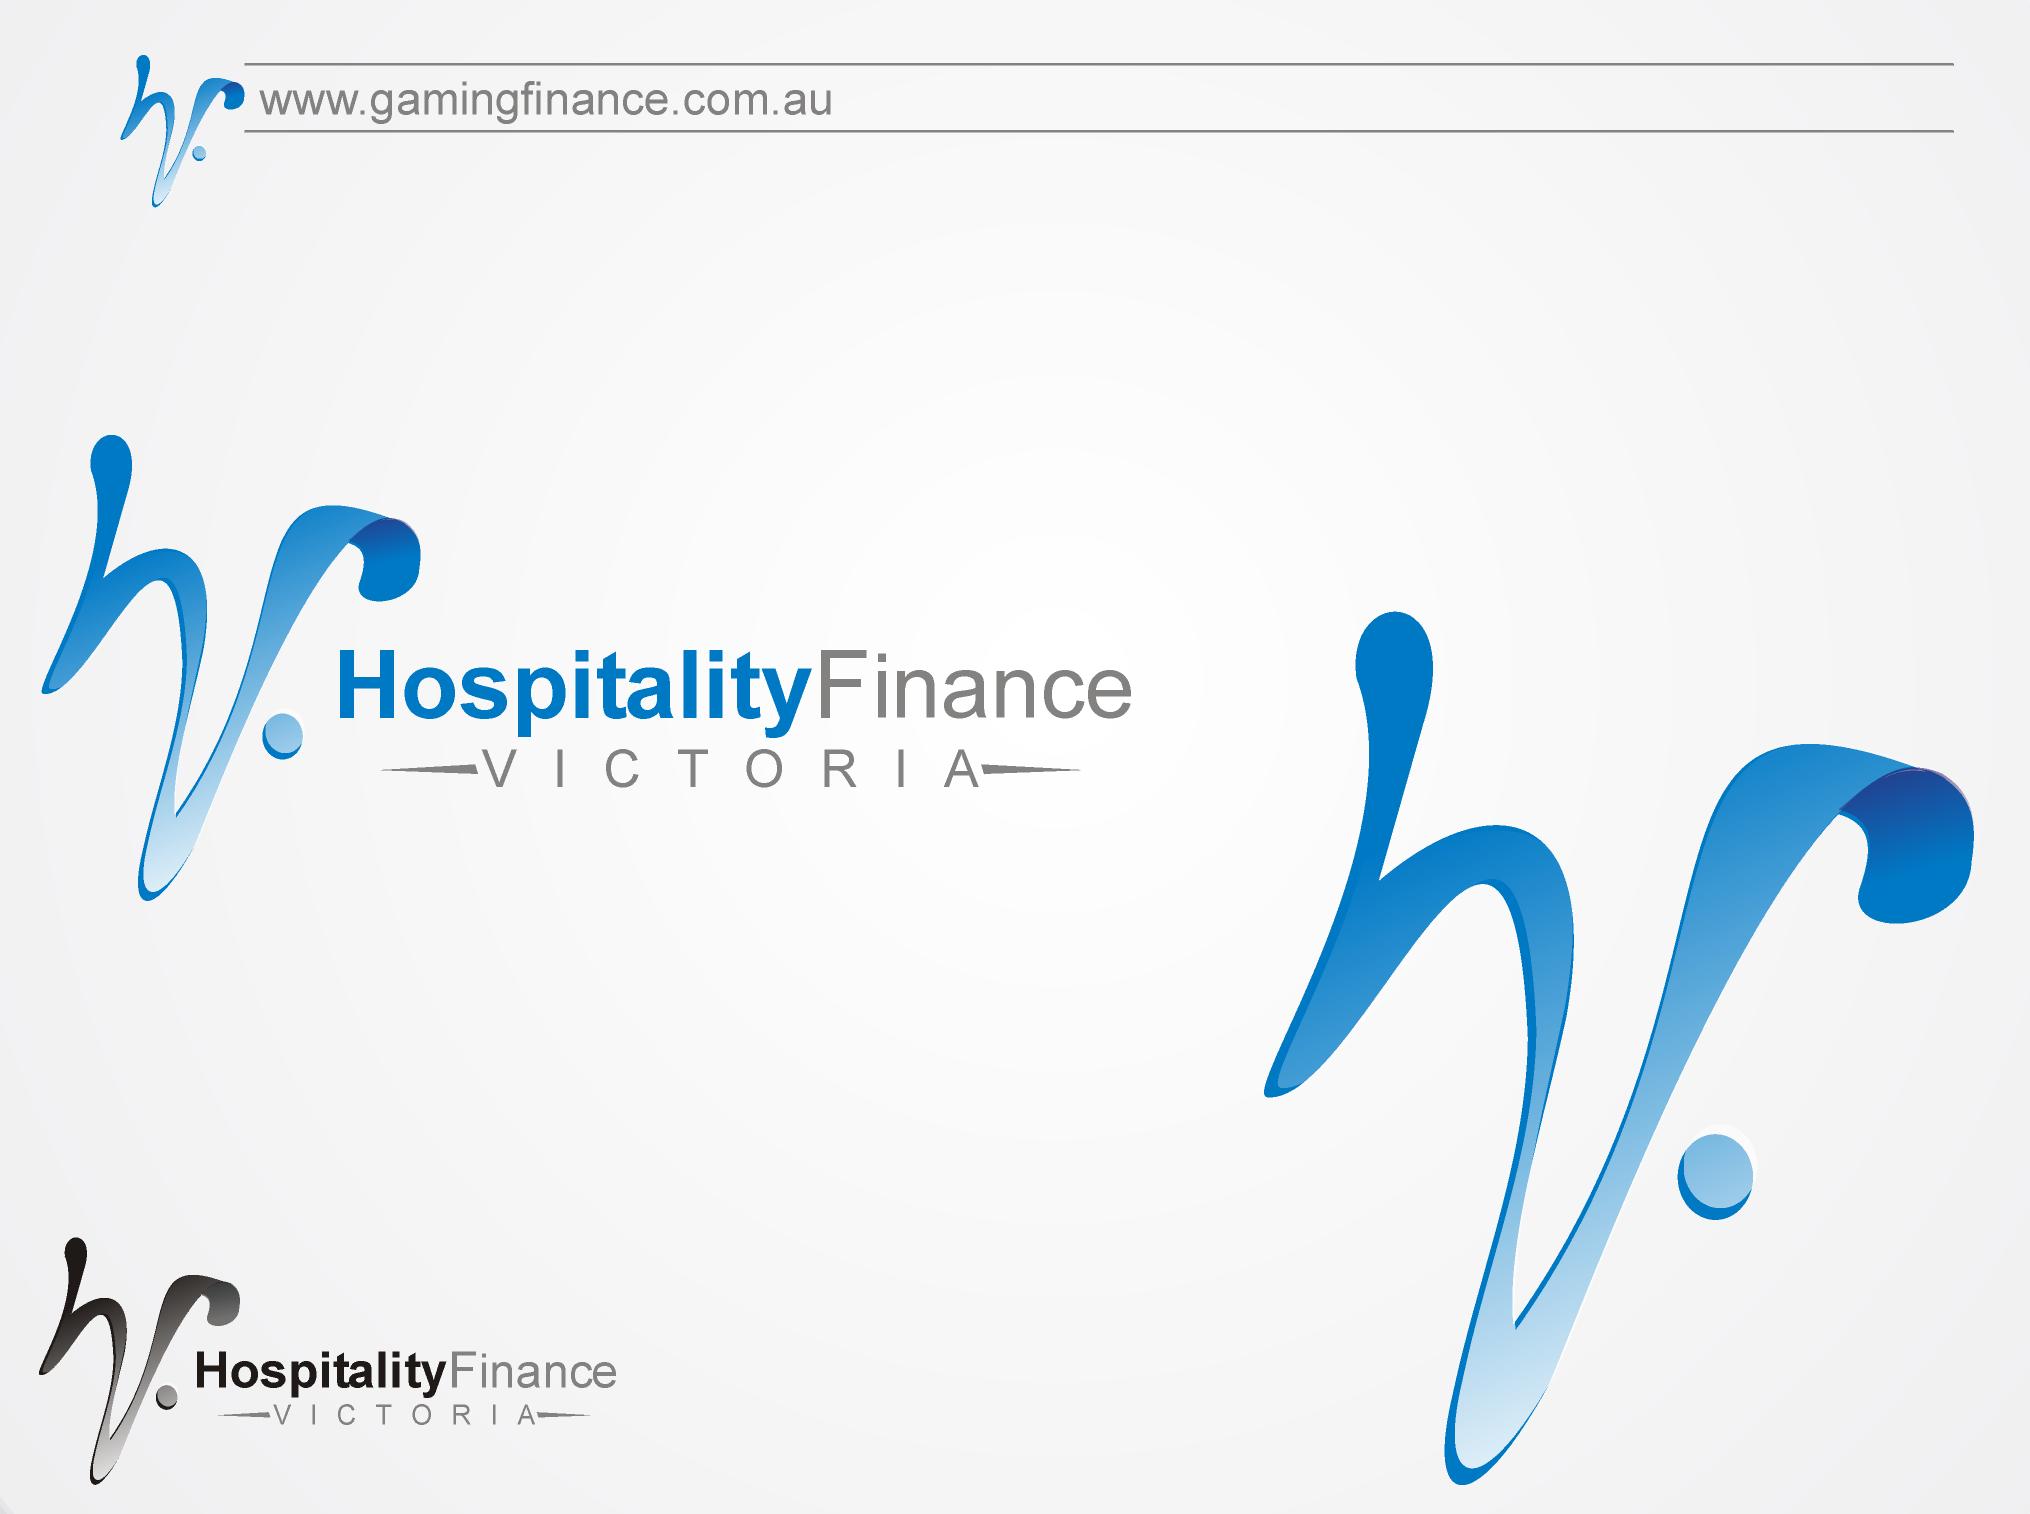 logo for Hospitality Finance Victoria